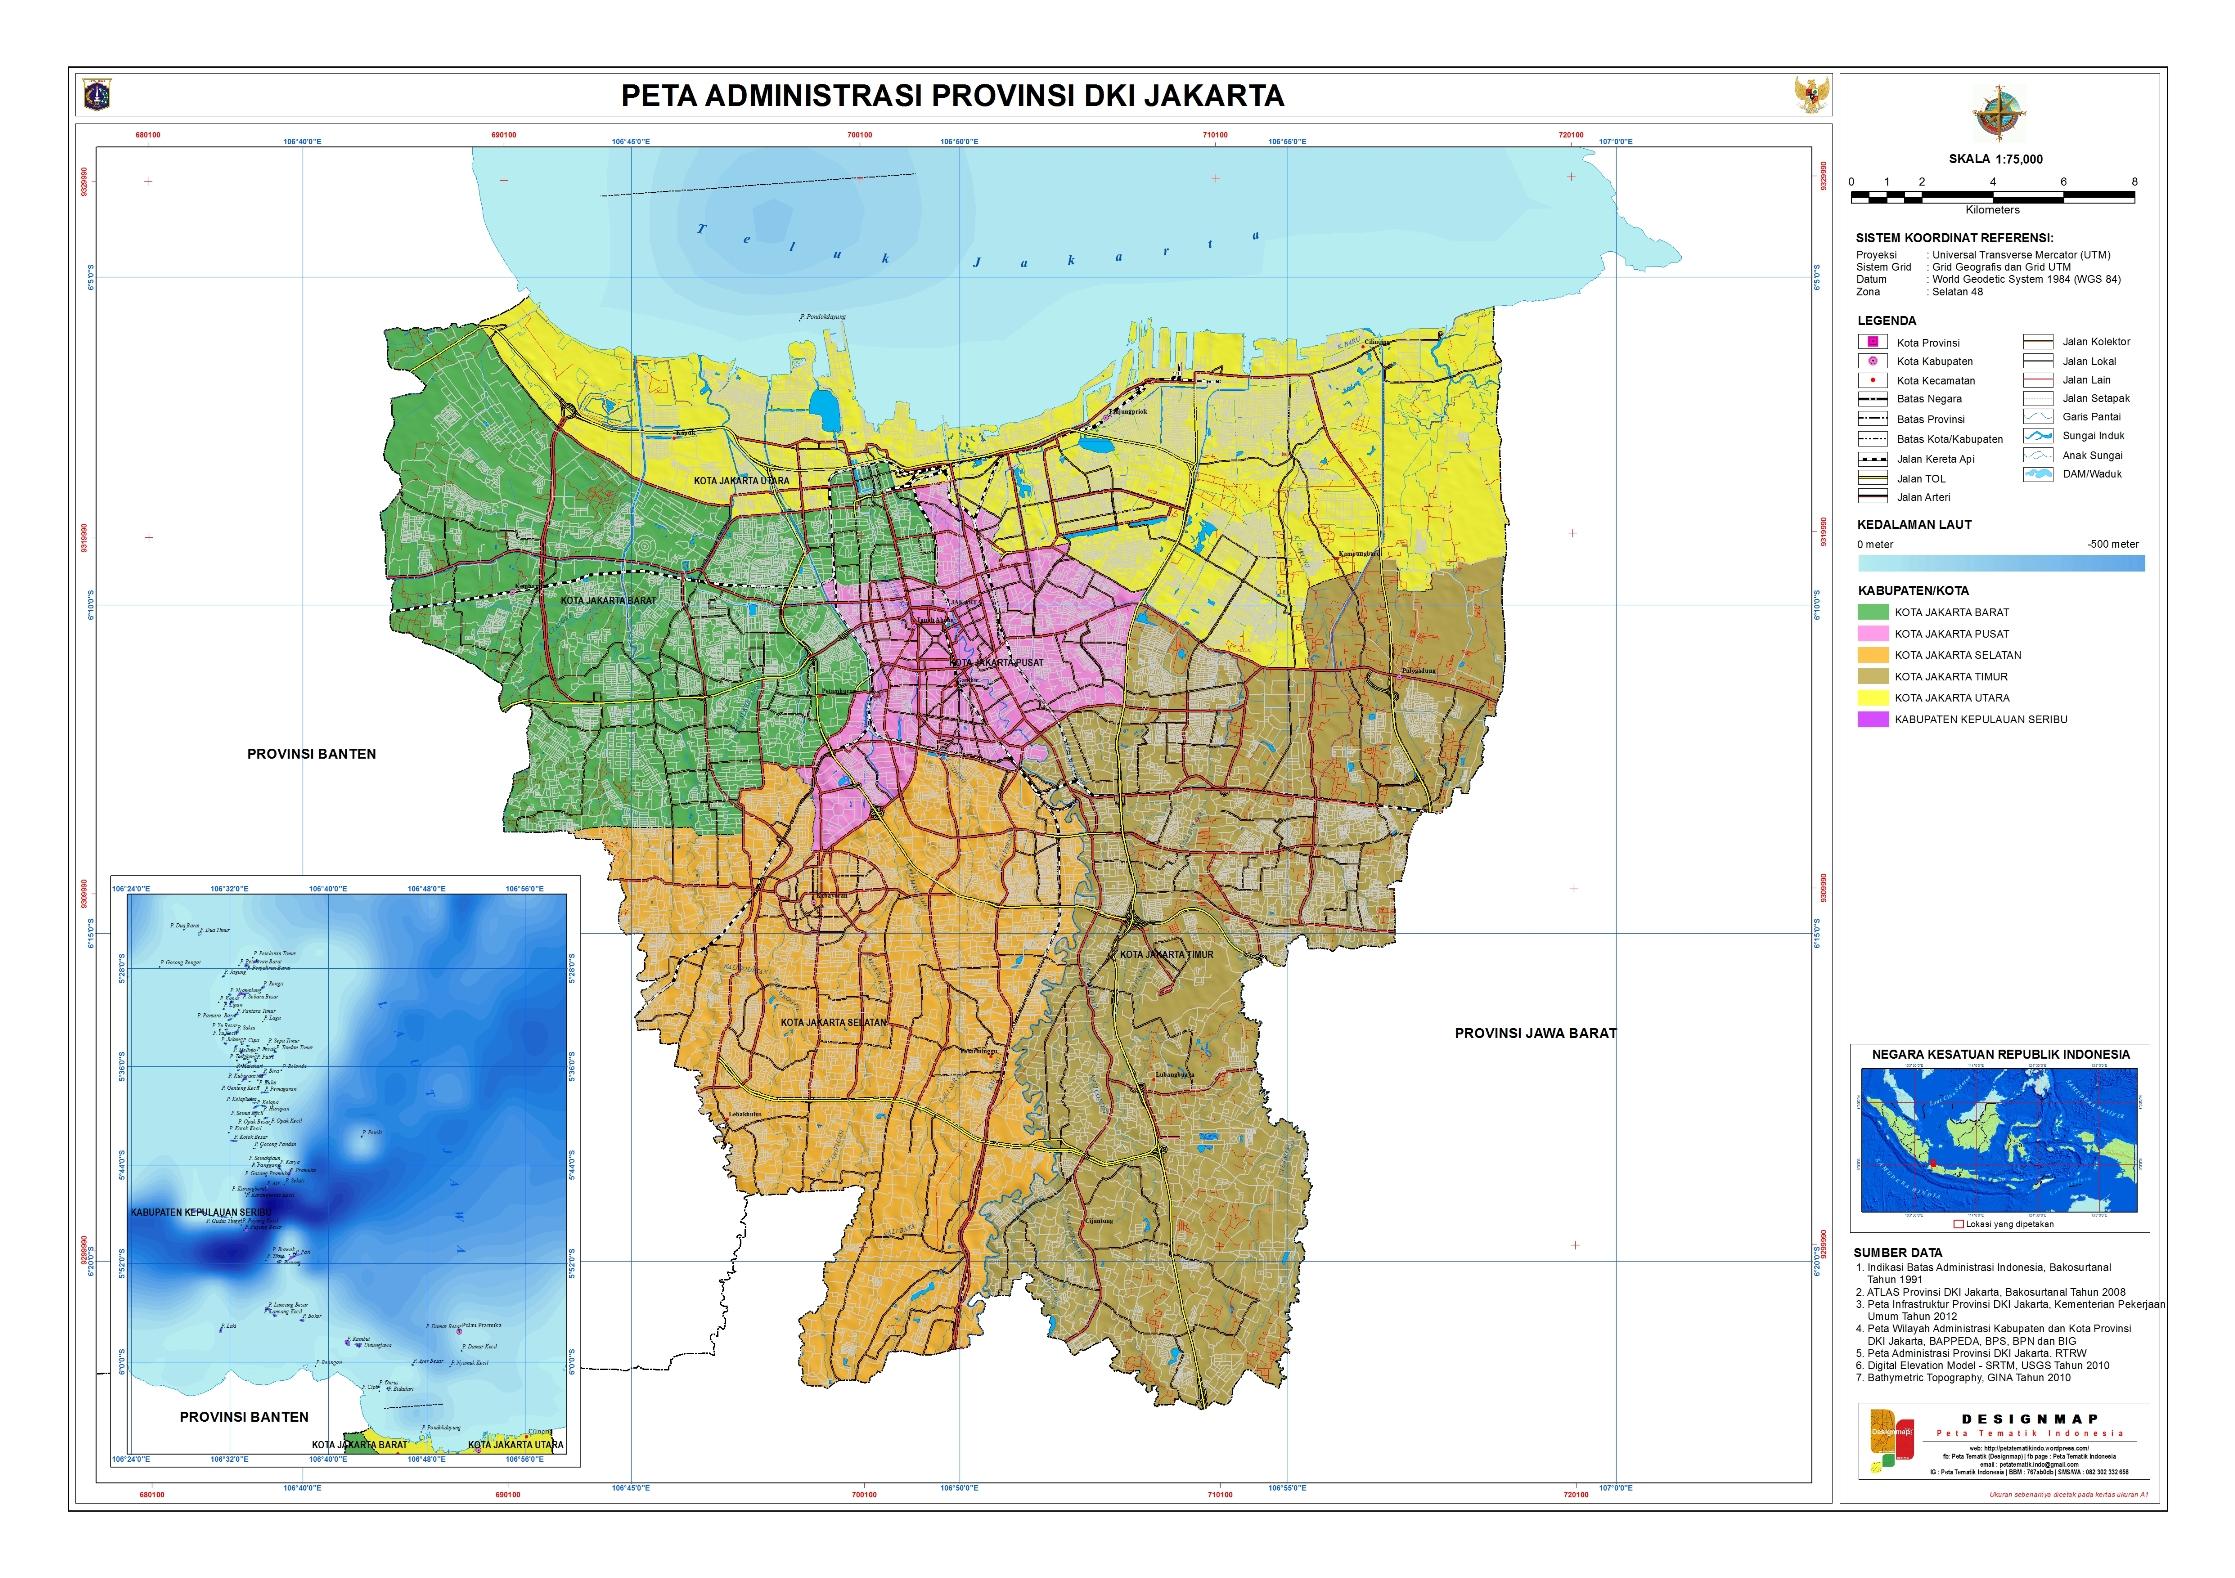 Catatan Kuliah Analisis Geografi Regional Dki Jakarta Taman Hutan Tebet